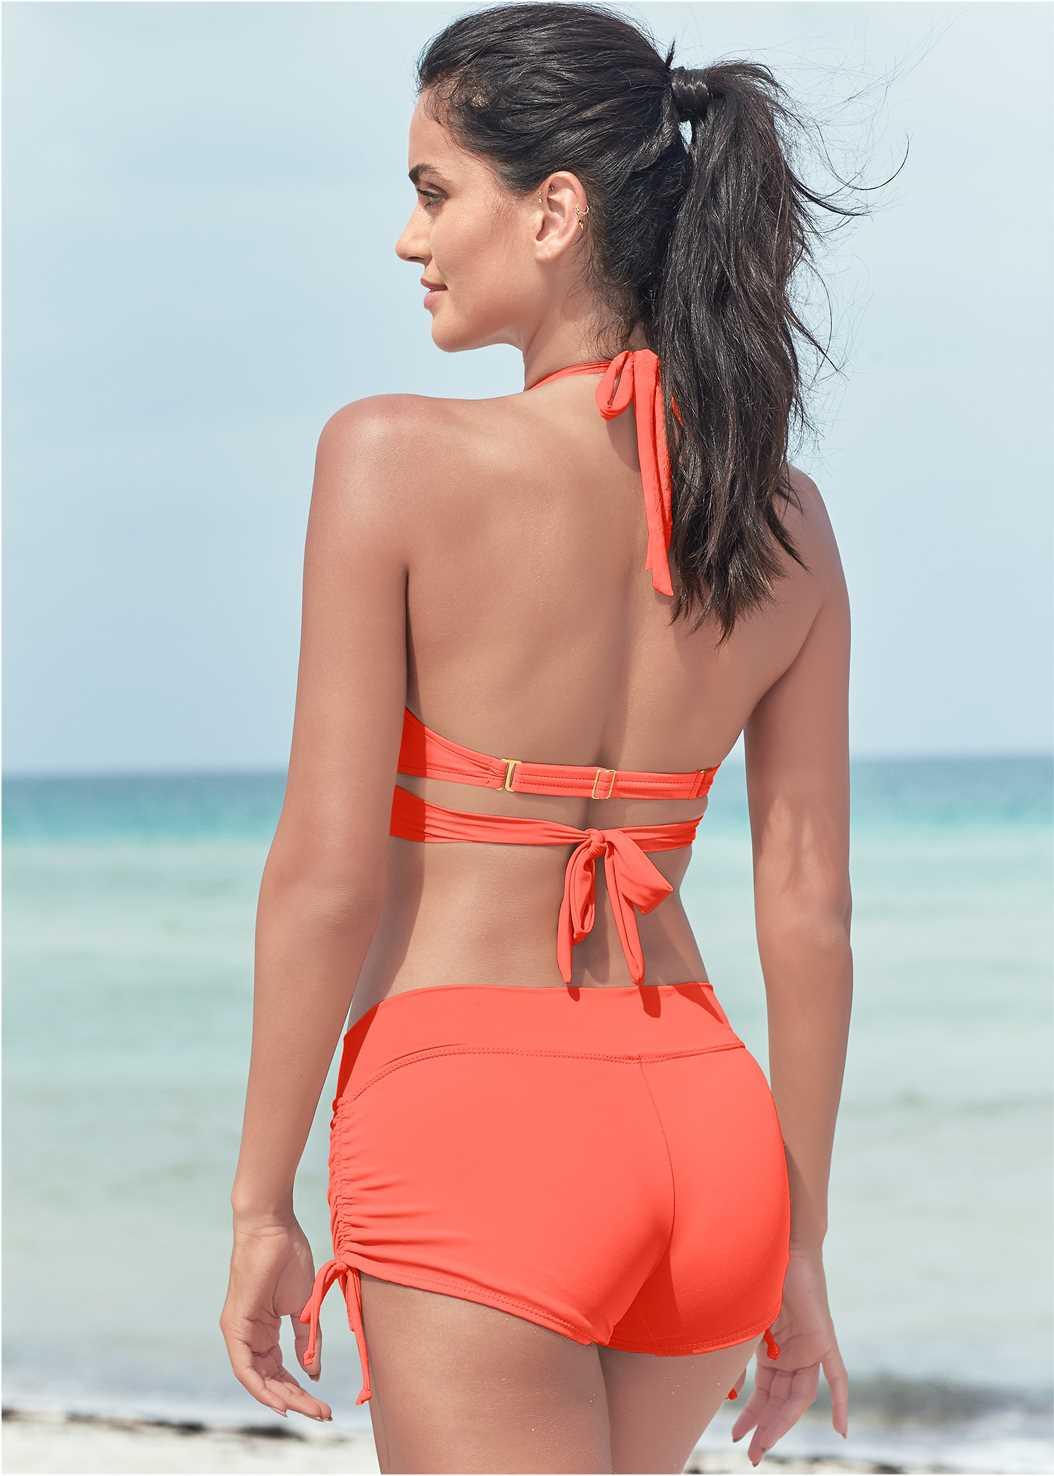 Underwire Wrap Top,Adjustable Side Swim Short,Scoop Front Classic Bikini Bottom